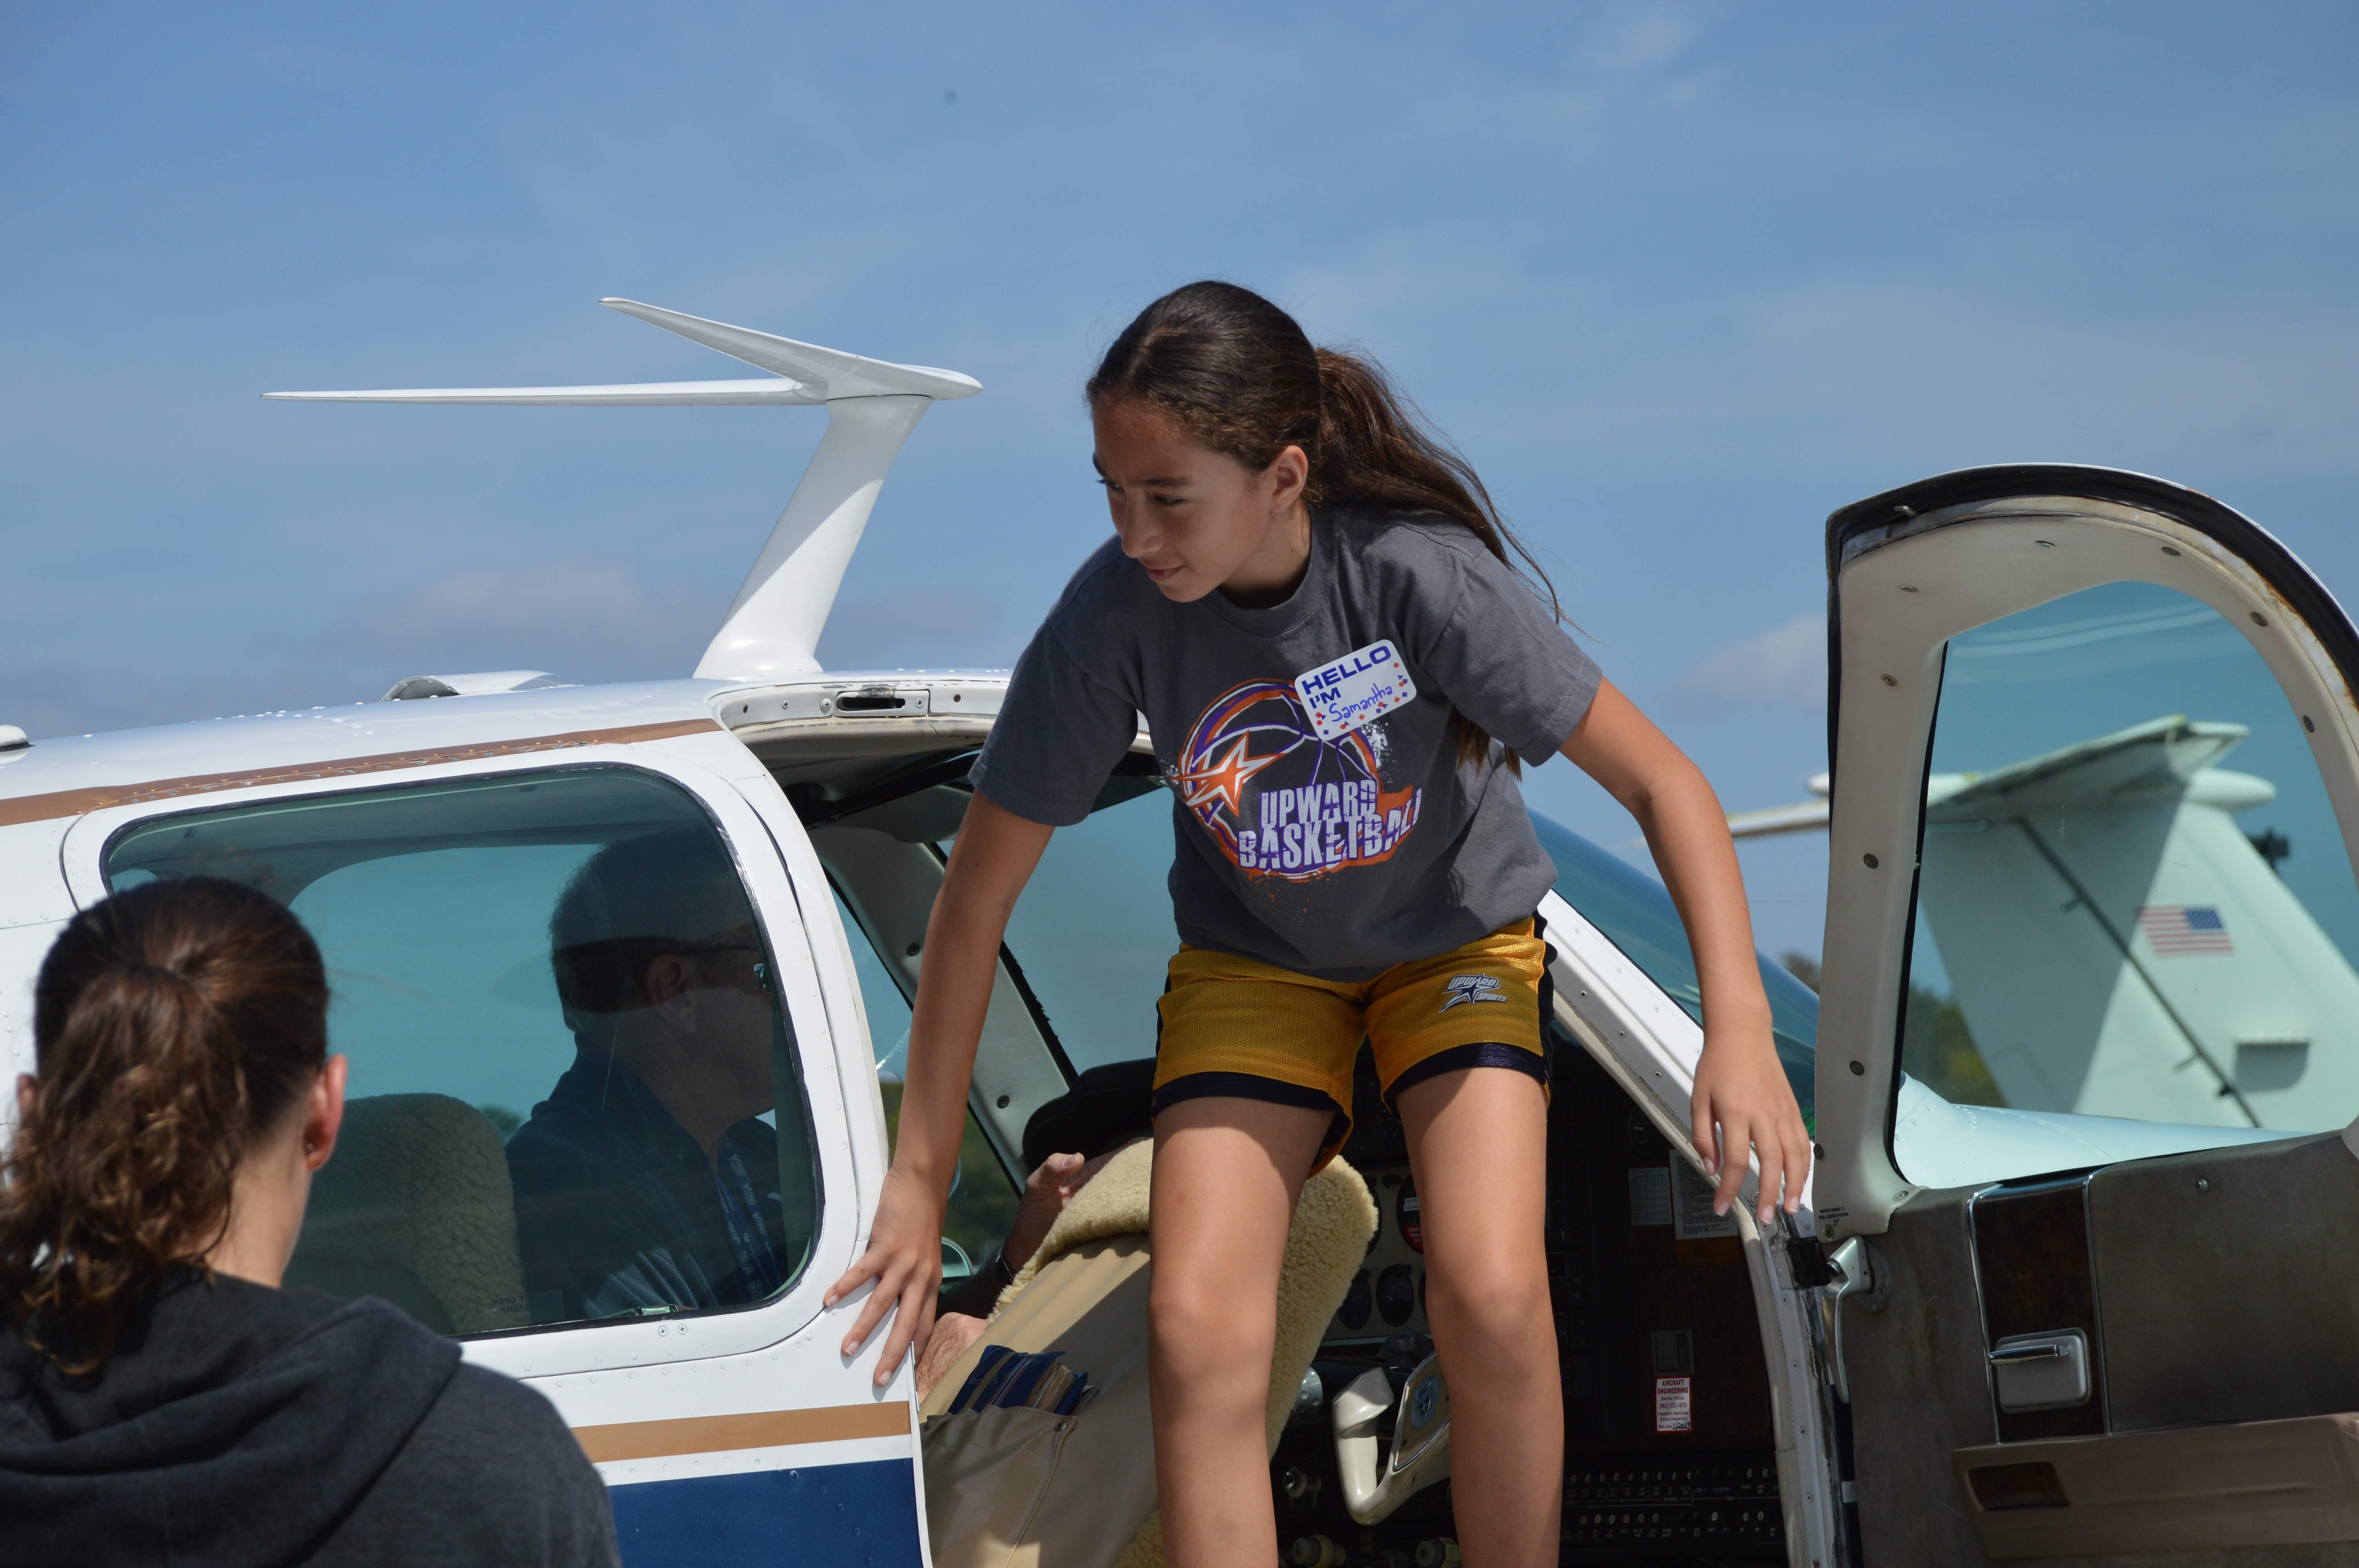 Samantha Jaksetic climbing out of aircraft after flight.